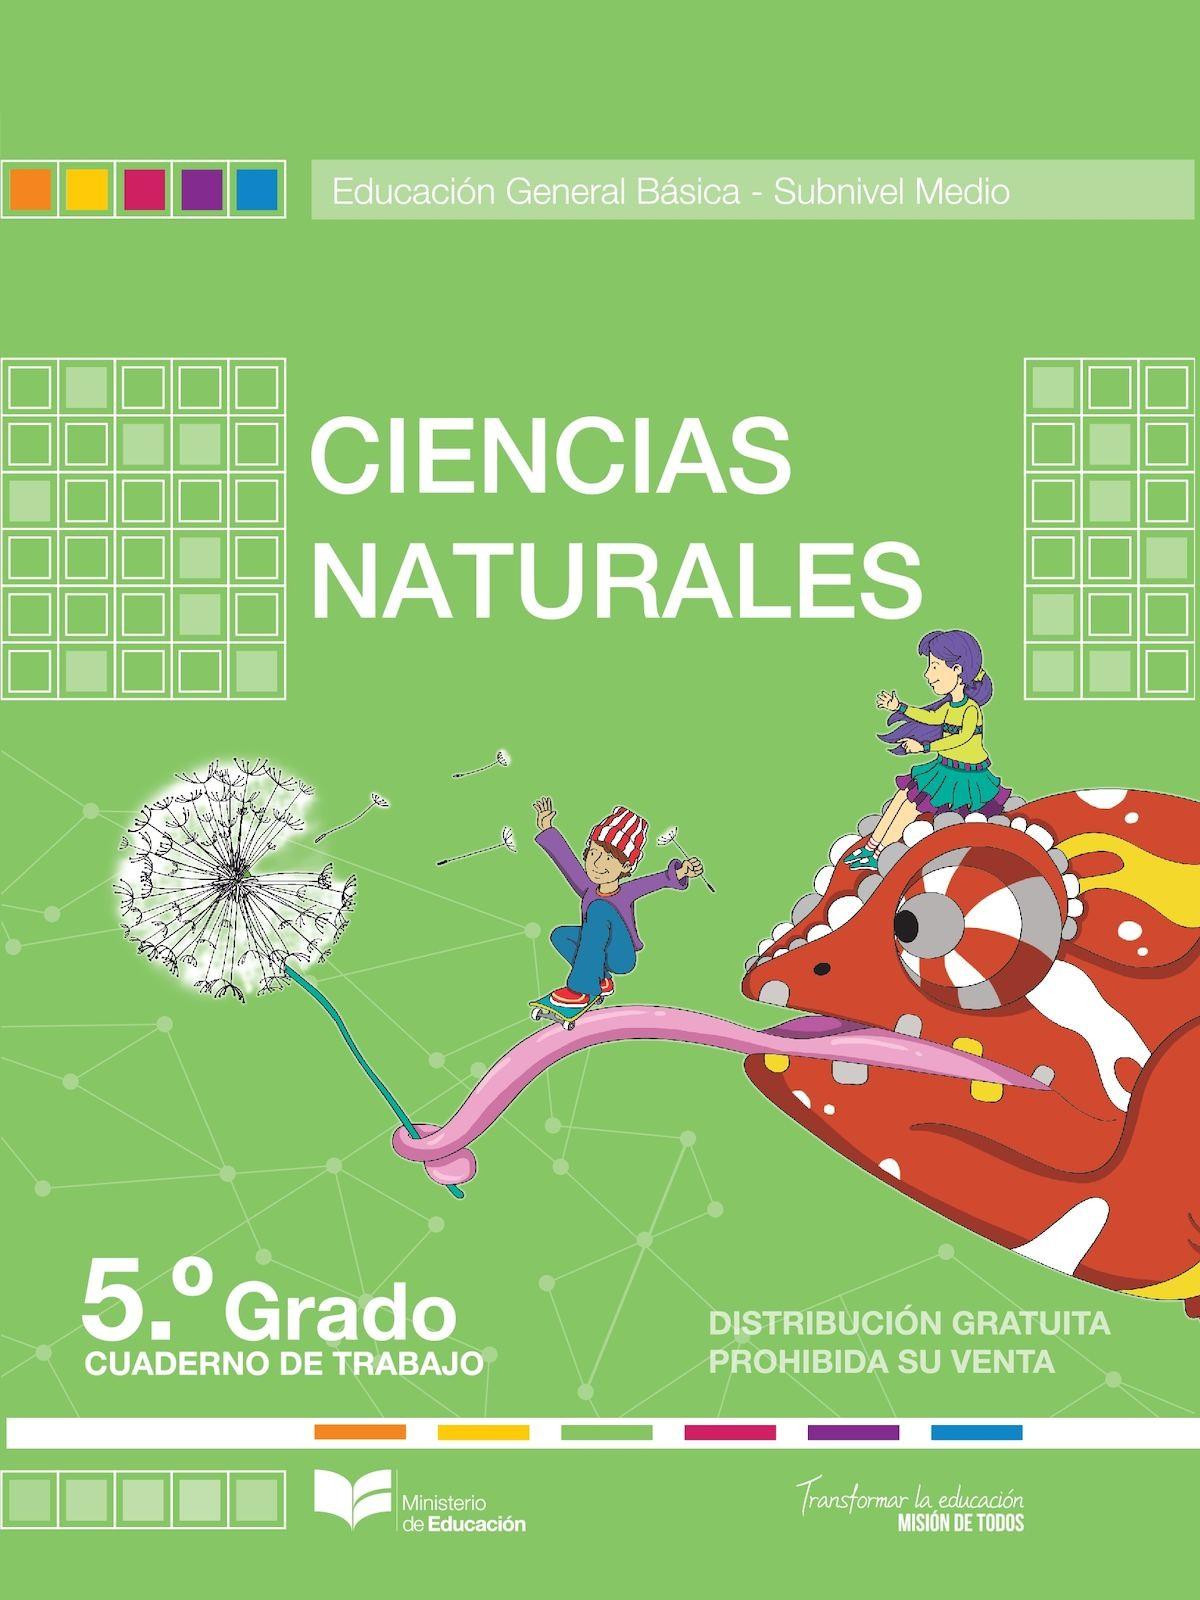 Calendario Lunar Germinacion Más Caliente Calaméo Ccnn 5 Egb Cuaderno Of Calendario Lunar Germinacion Más Caliente 9na Convenci³n Mundial Del Chile Zacatecas Pages 1 50